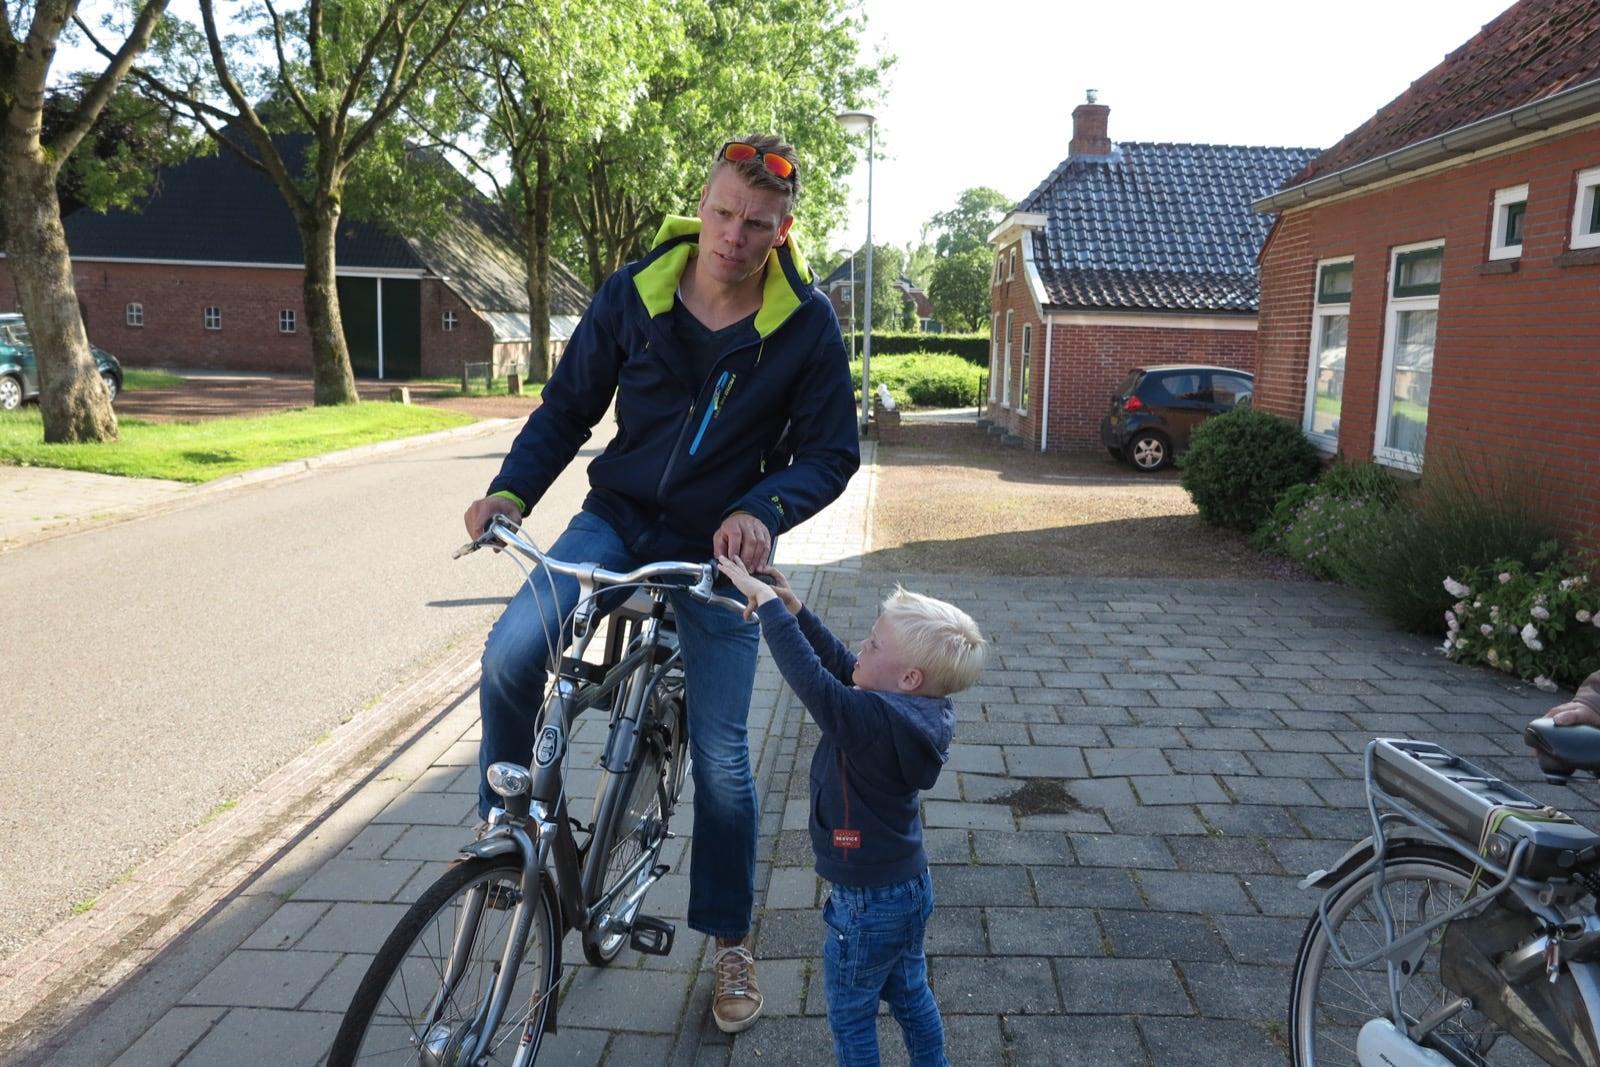 et-fiets-en-fietser-52-thesinger-fietstocht---alfred-en-guus-oi.jpg